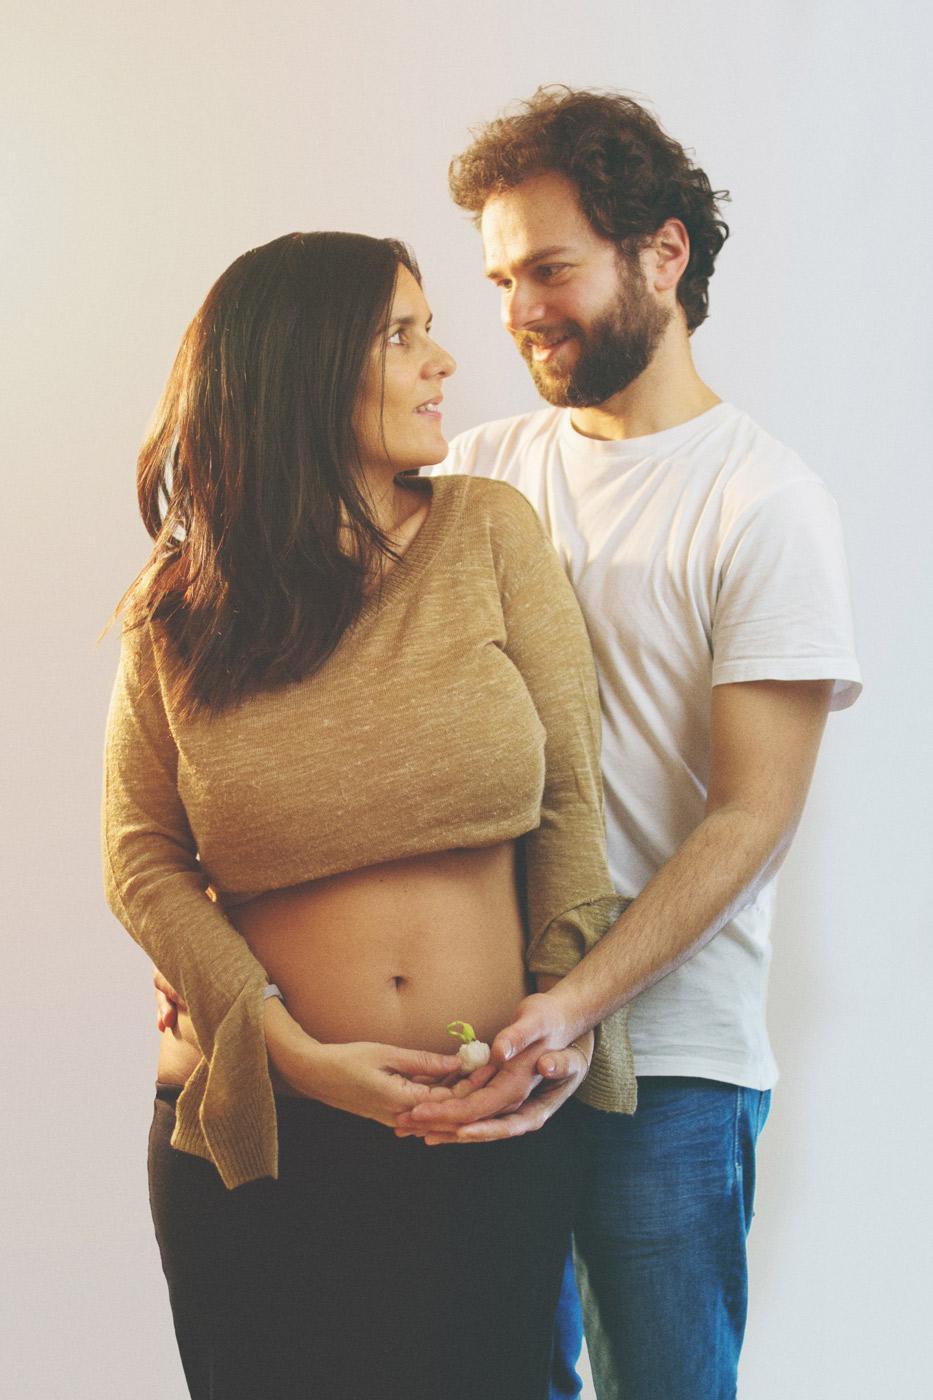 autorretrato original de embarazo donde padre y madre sujetan la semillita